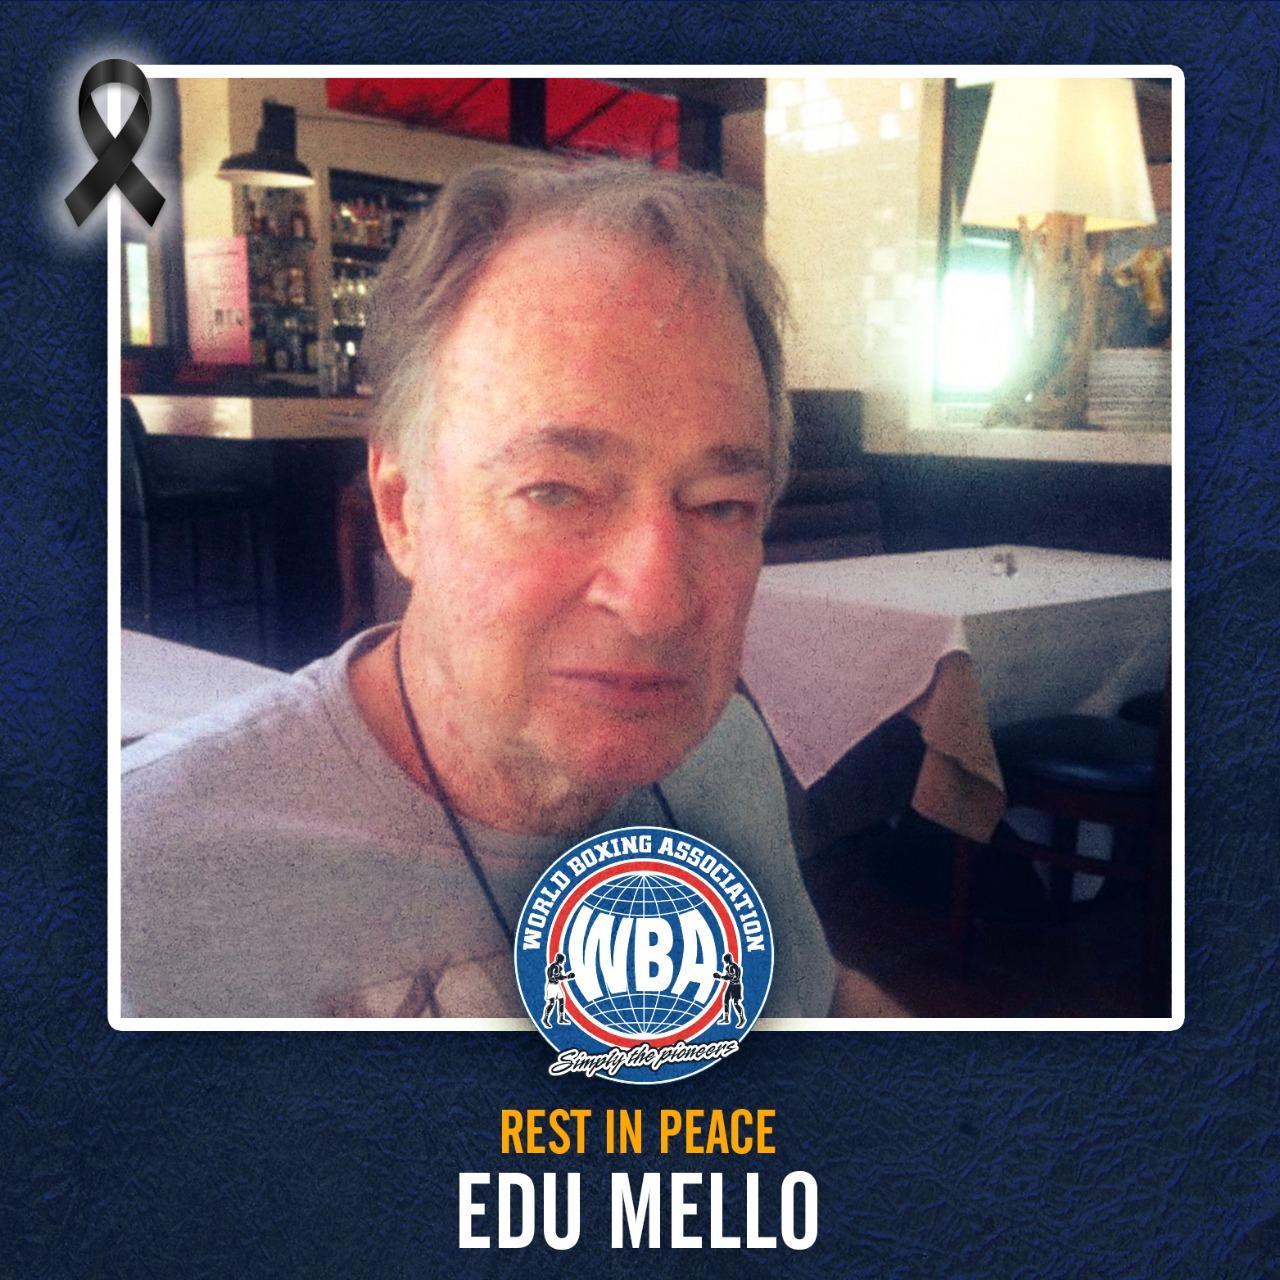 WBA mourns the death of promoter Edu Mello